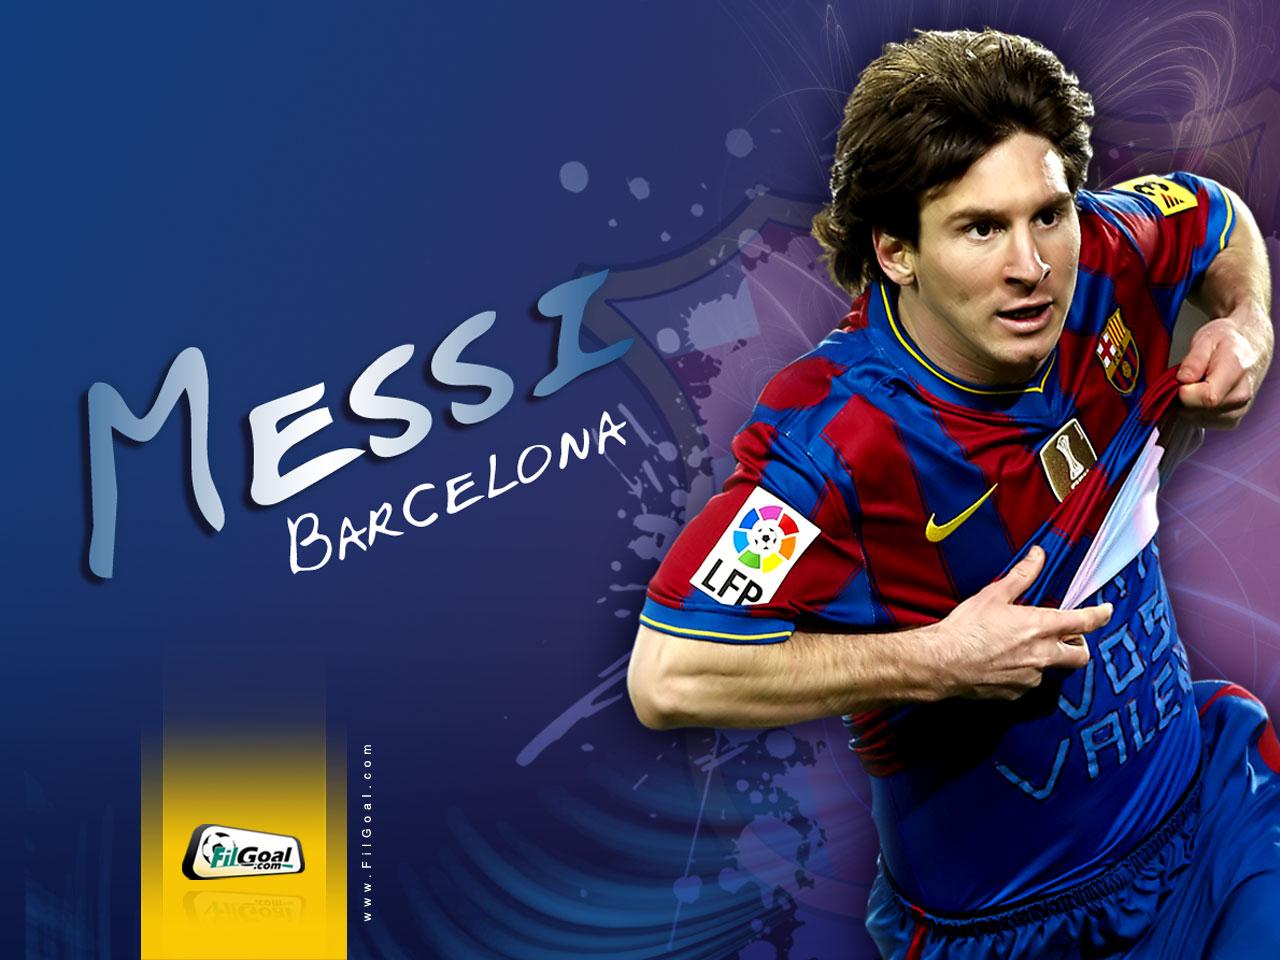 Lionel Messi 2013 Wallpaper 2012 Messi Wallpaper 1280x960